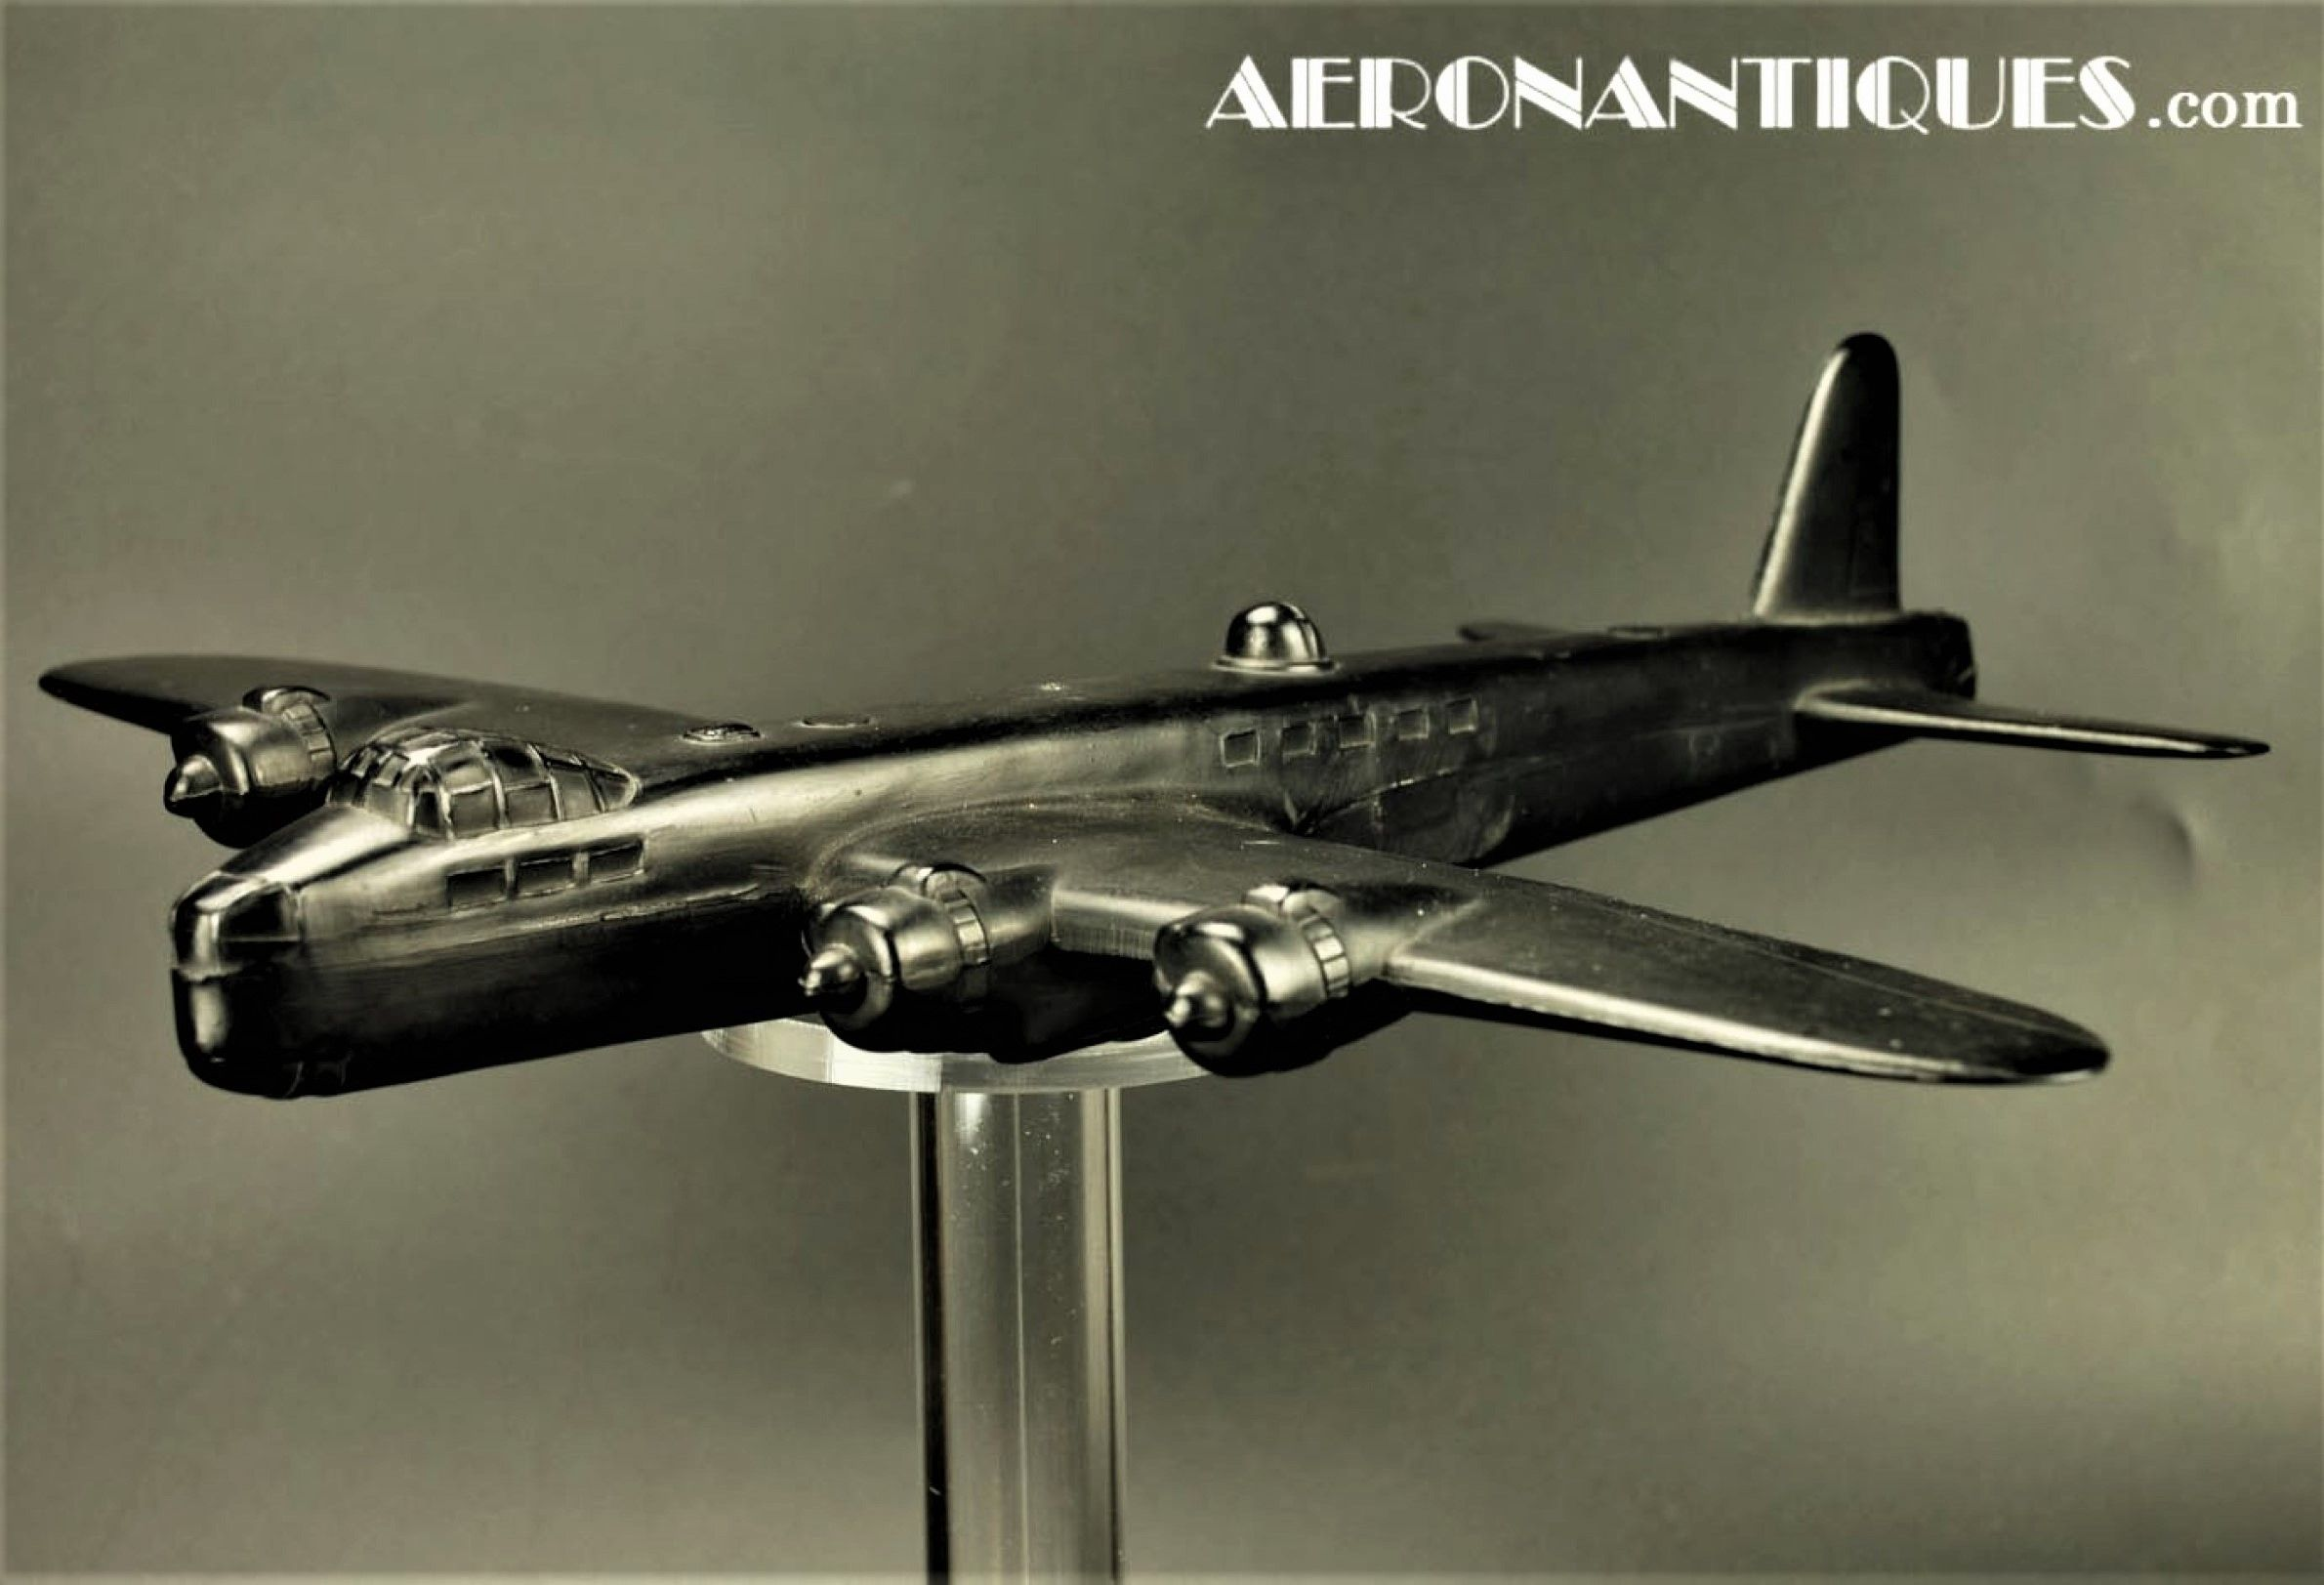 WWII RAF Short Sterling Bomber Spotters Recognition Model